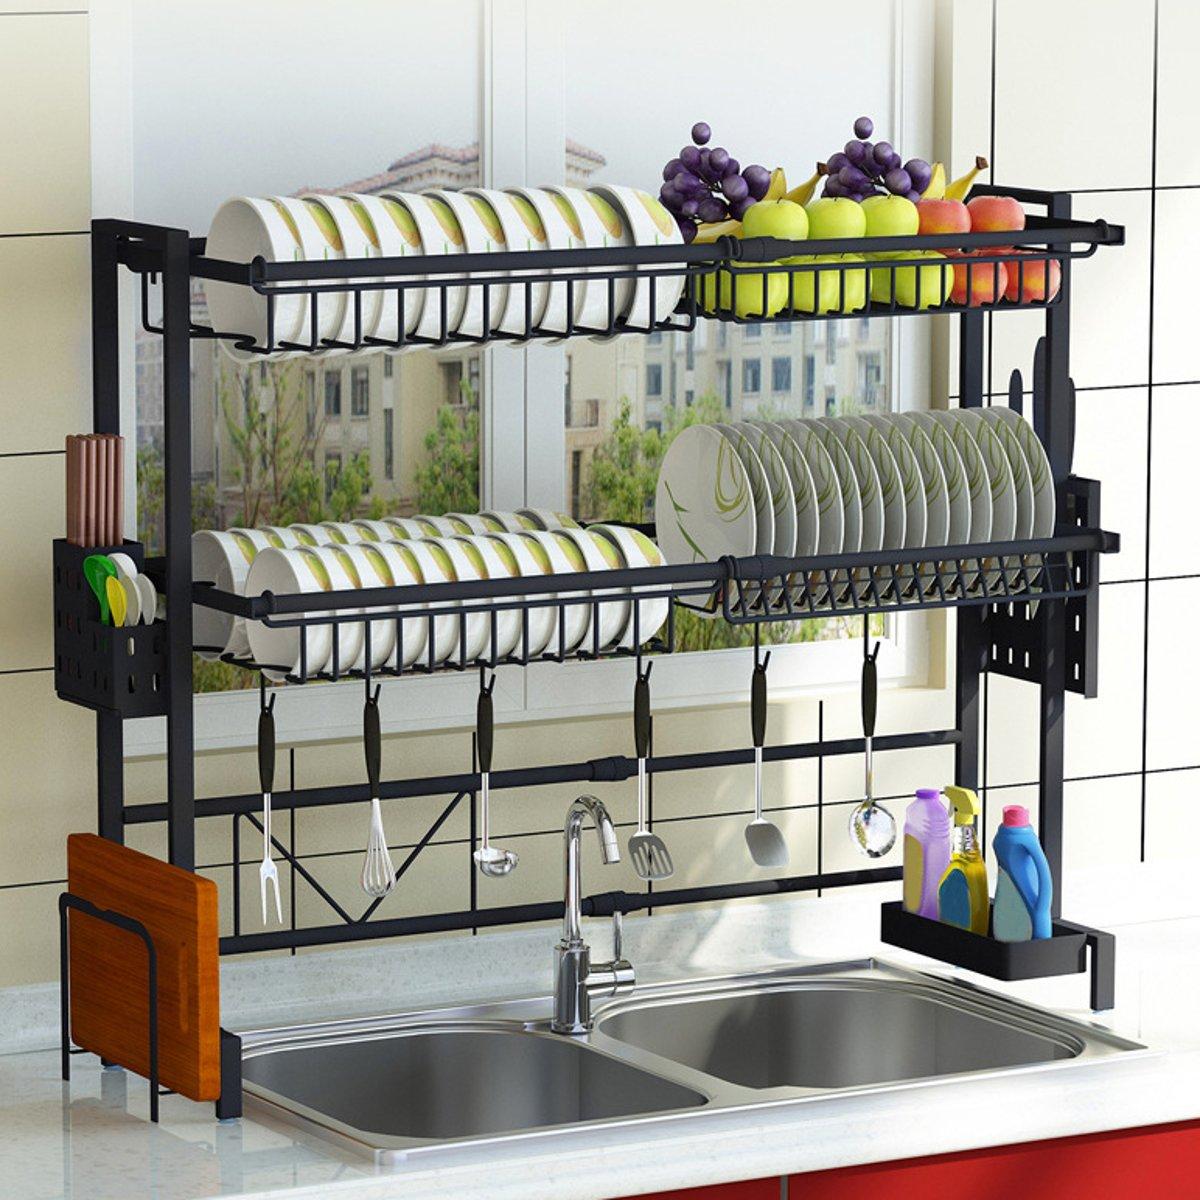 multi use stainless steel dishes rack dual sink drain rack adjustable kitchen oragnizer rack dish shelf sink drying rack 1 2tier